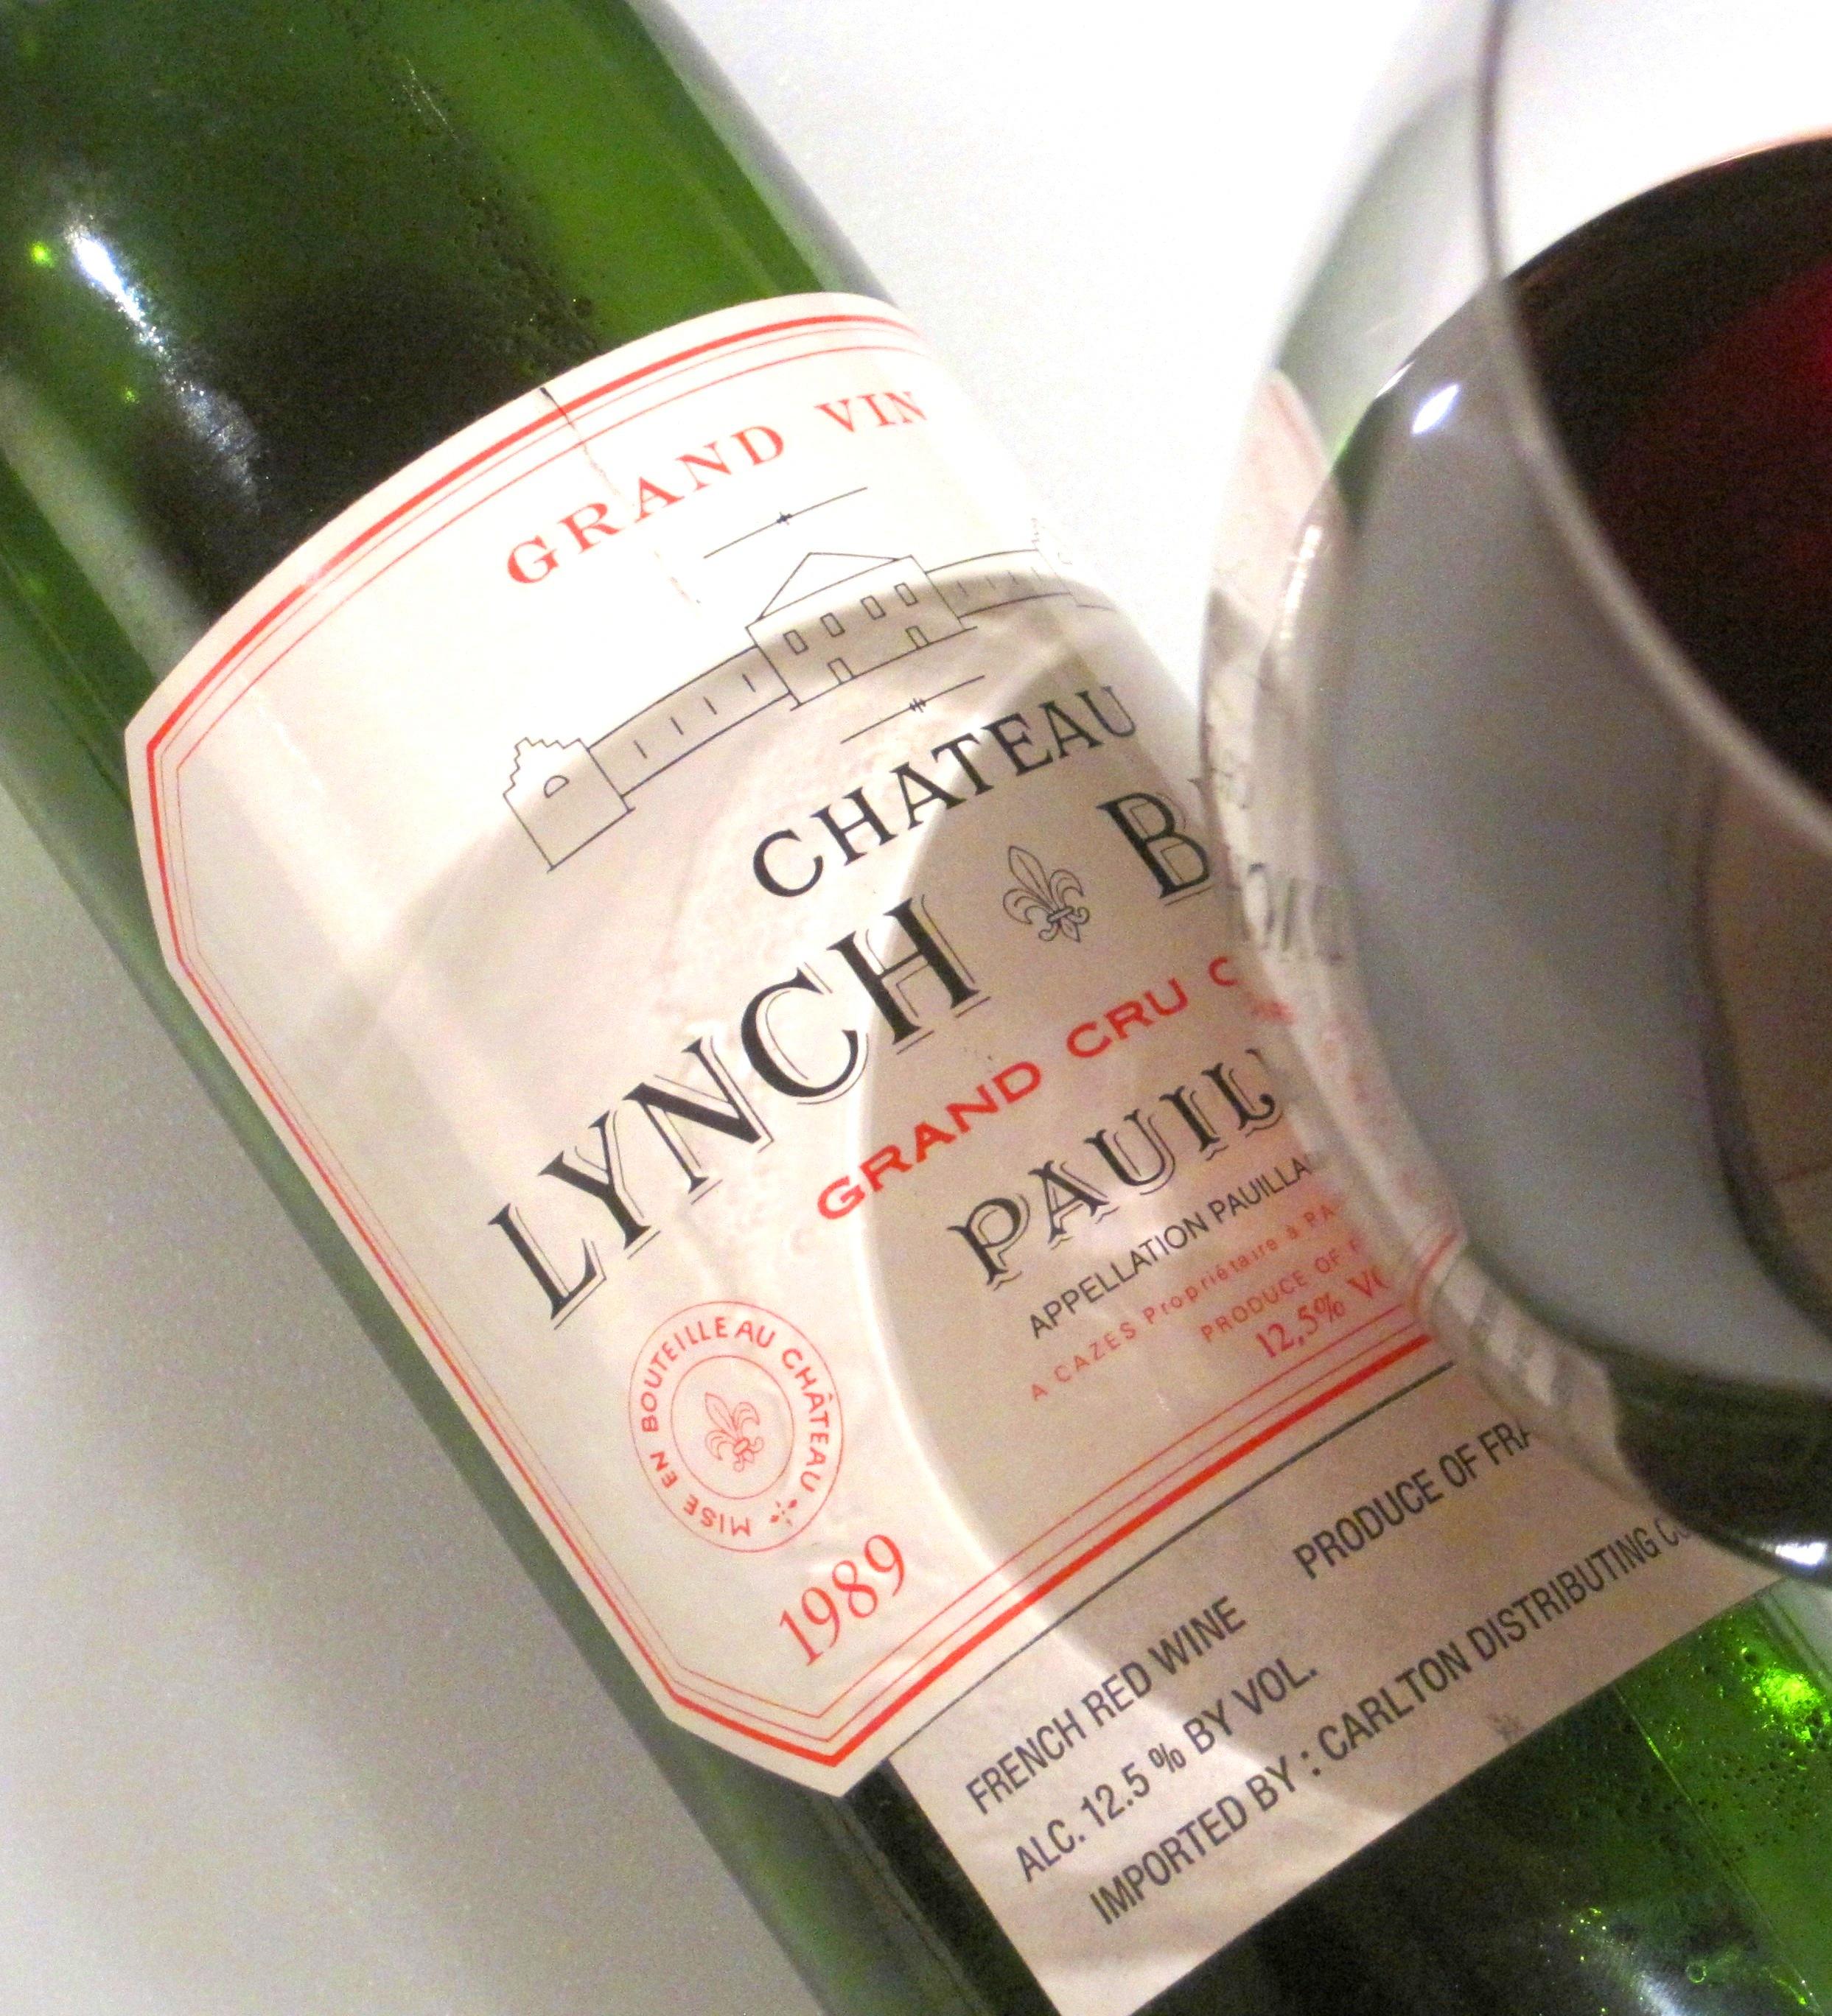 lynch bages 89 bottle & glass side